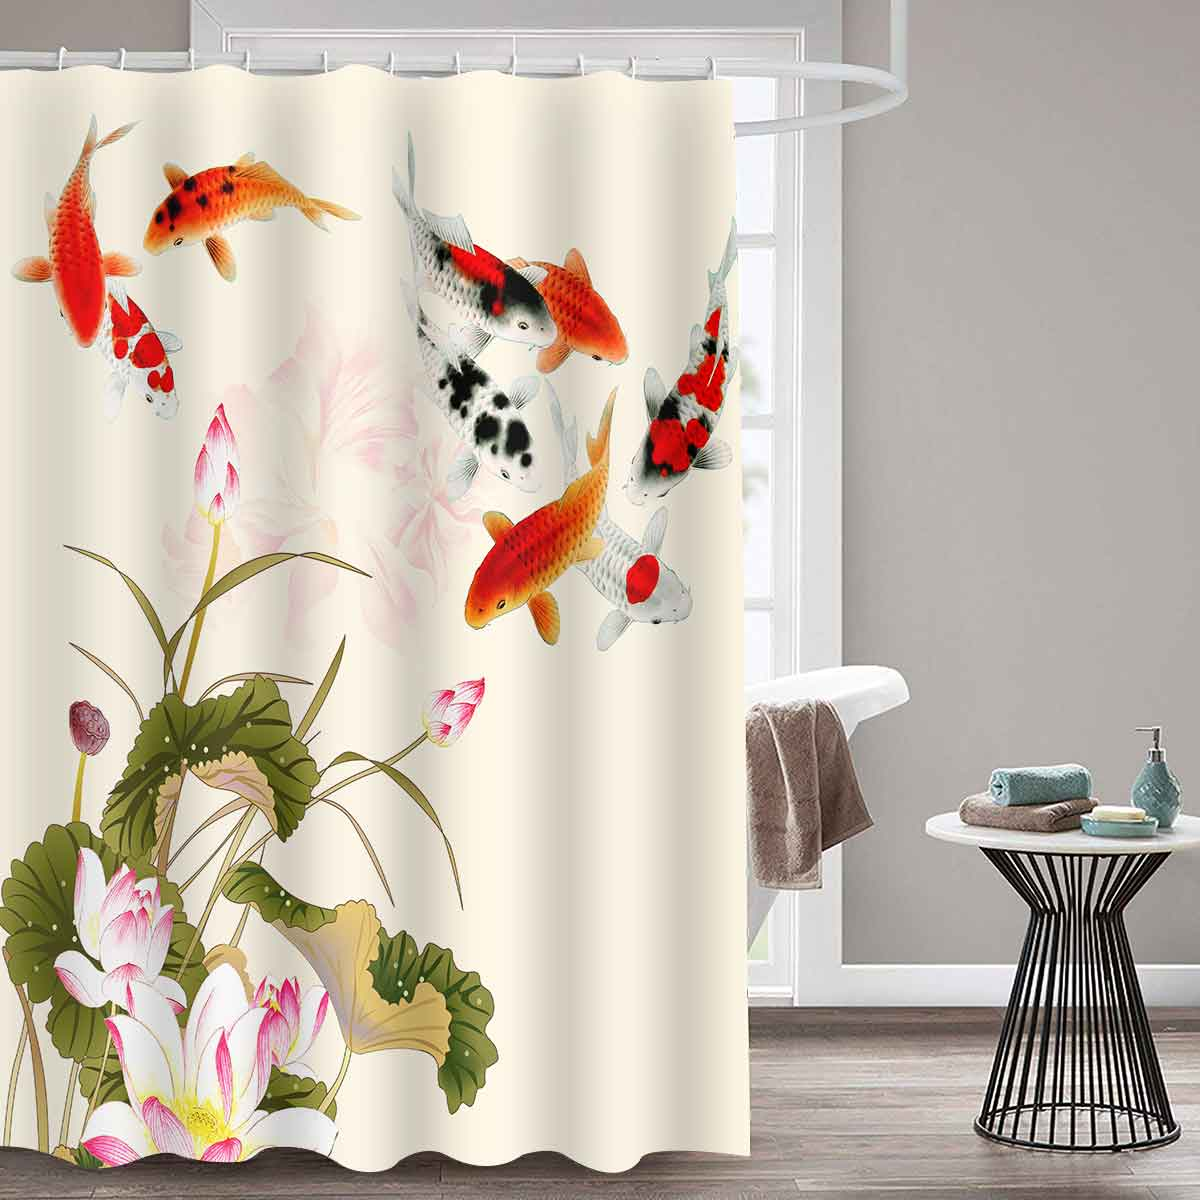 MTMETY Ocean Jellyfish Shower Curtain Polyester Waterproof Curtains Bathroom Chinese style koi Bath Screens rideau de douche